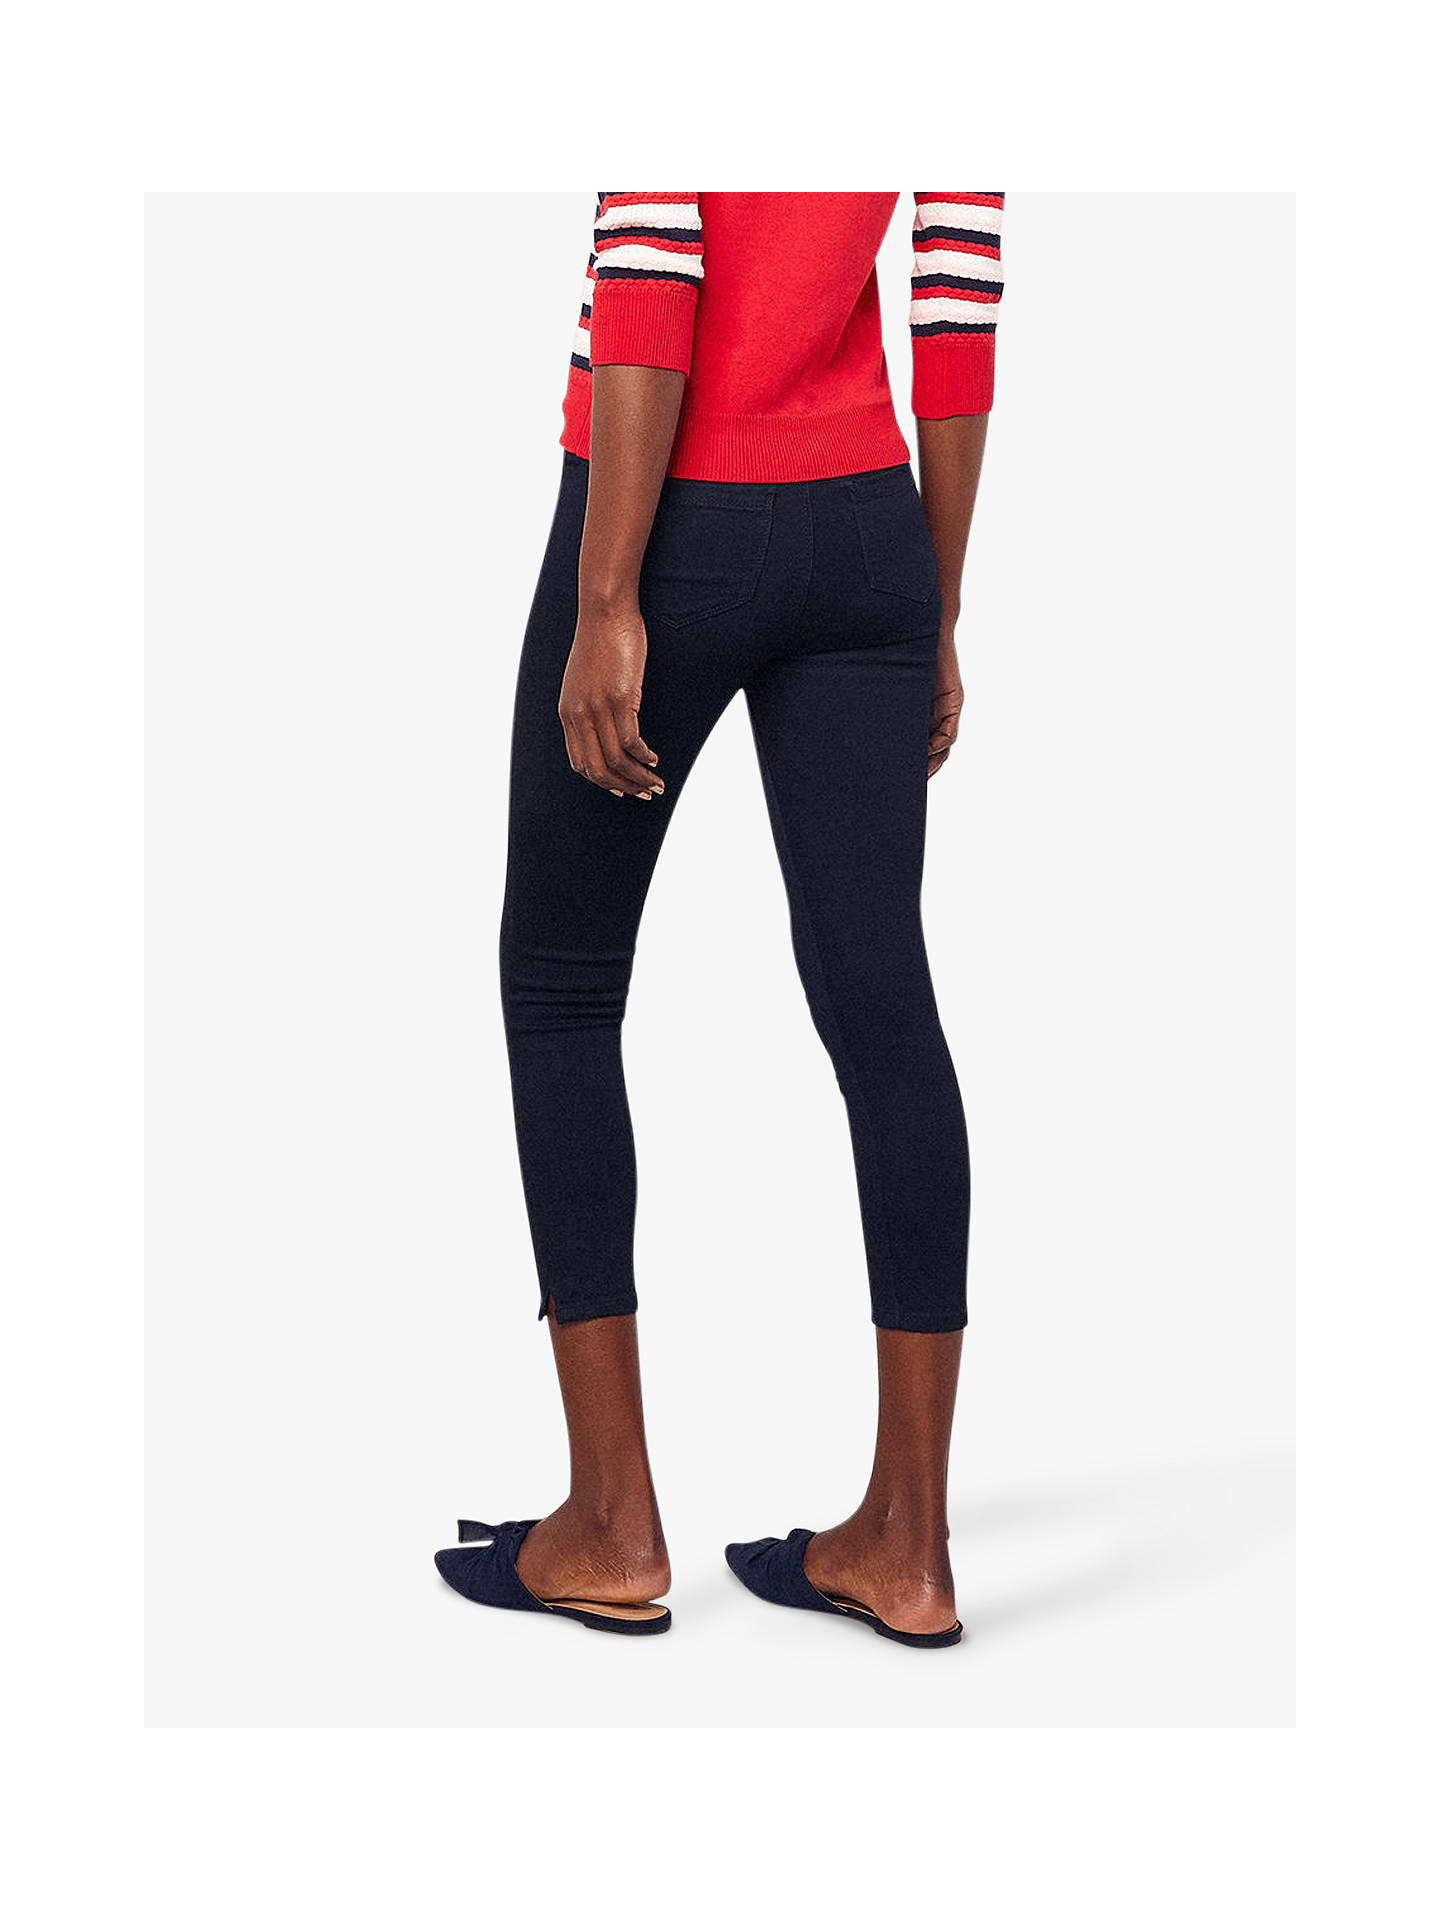 31e72a32885a ... Buy Oasis Grace Capri Trousers, Navy, 14 Online at johnlewis.com ...